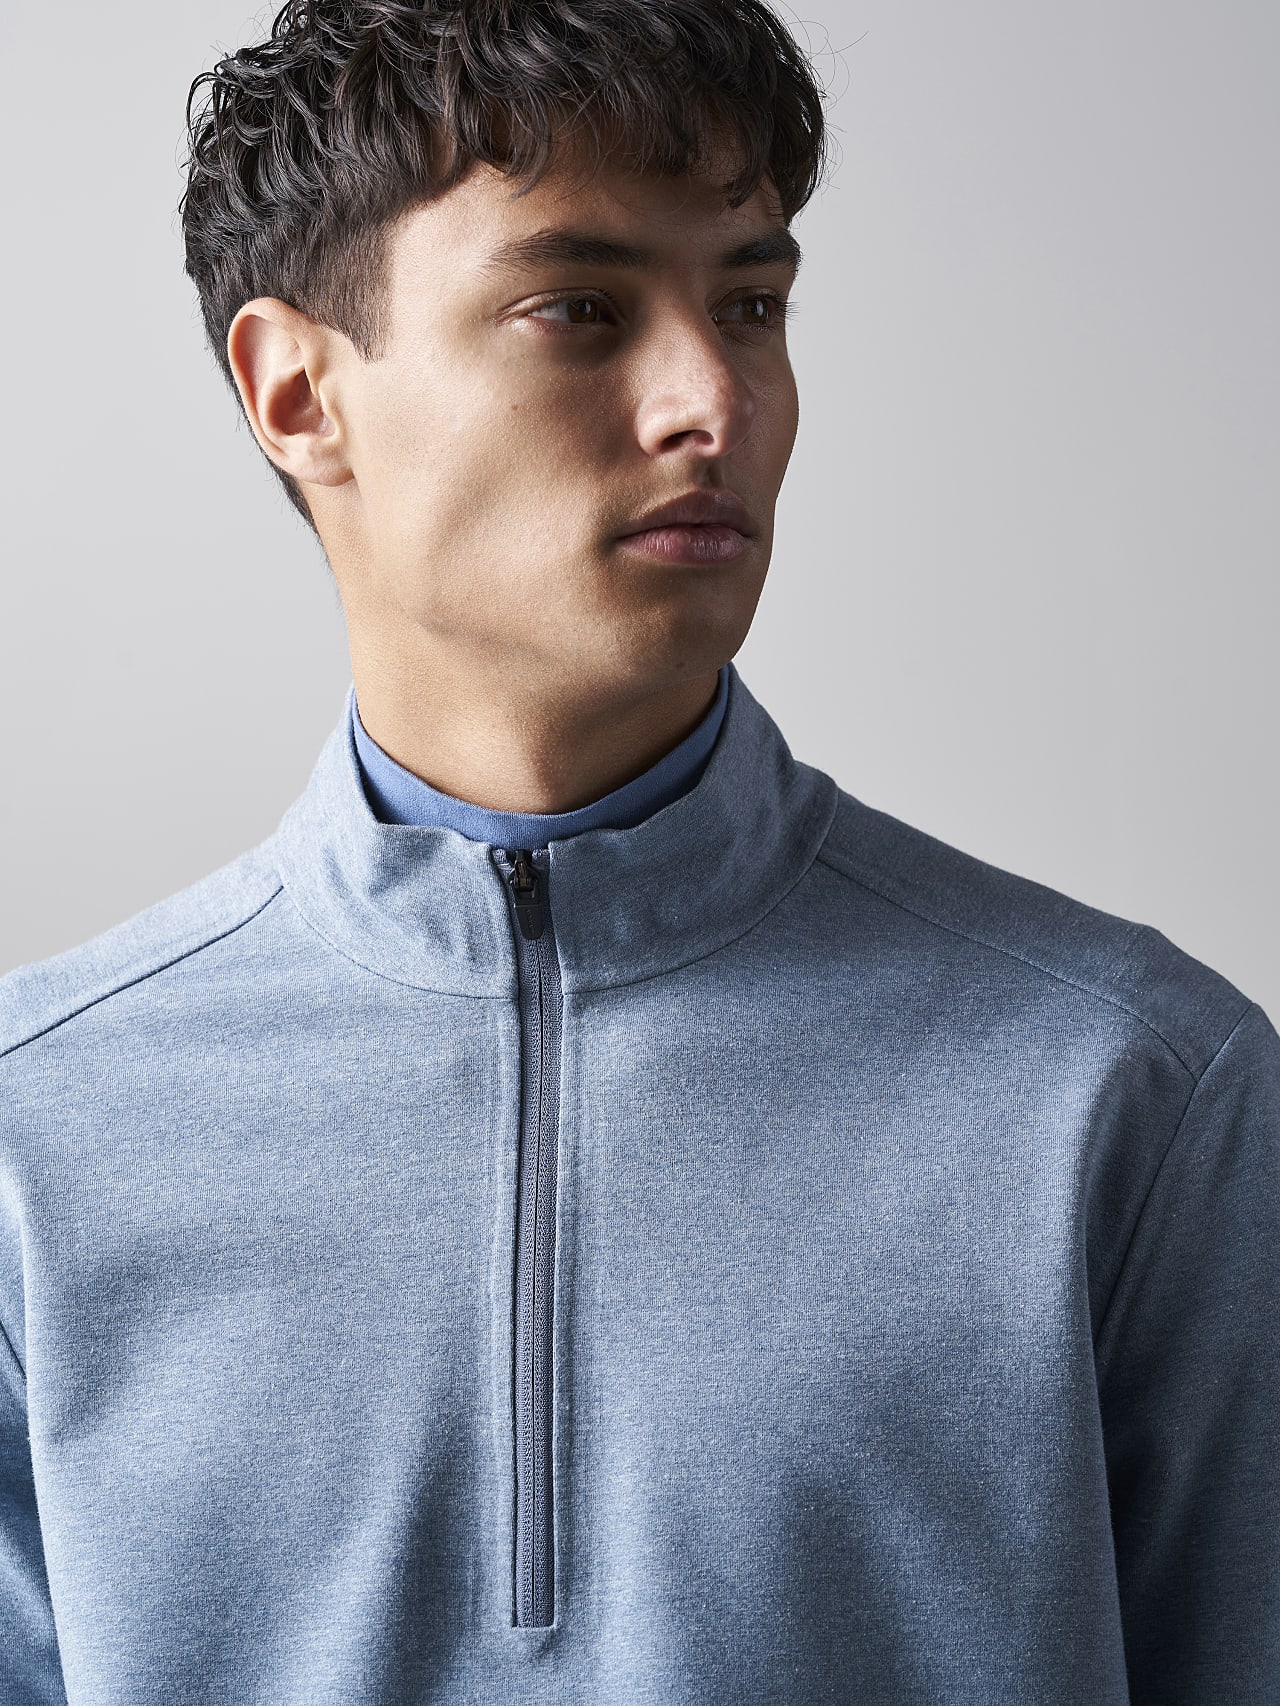 SROTO V1.Y5.02 Waterproof Half-Zip Sweatshirt medium blue Right Alpha Tauri